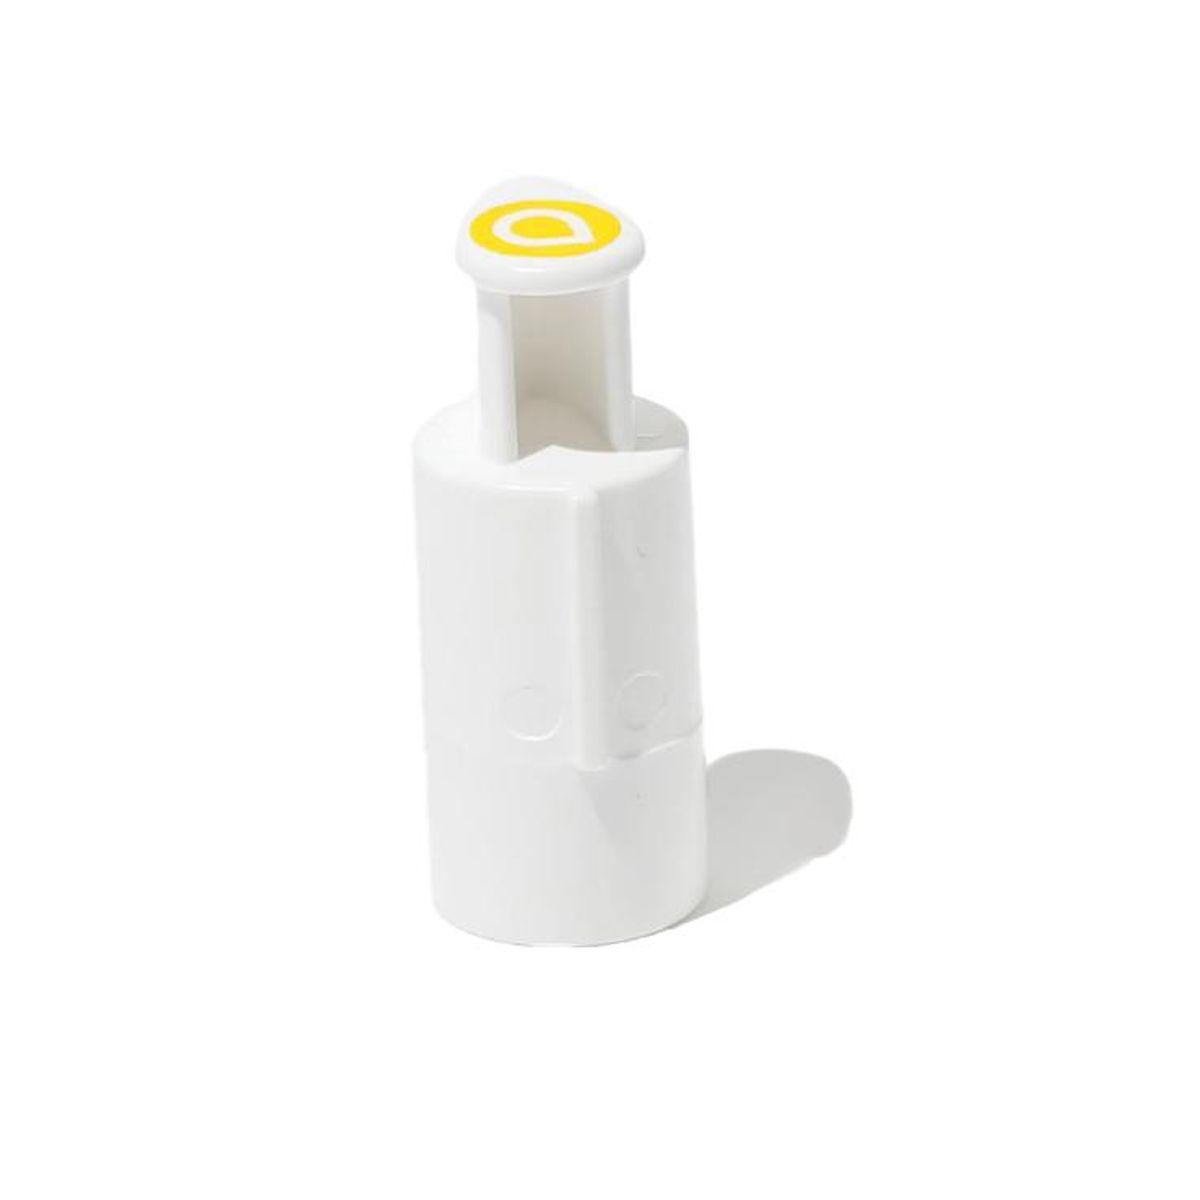 droplette collagen capsules